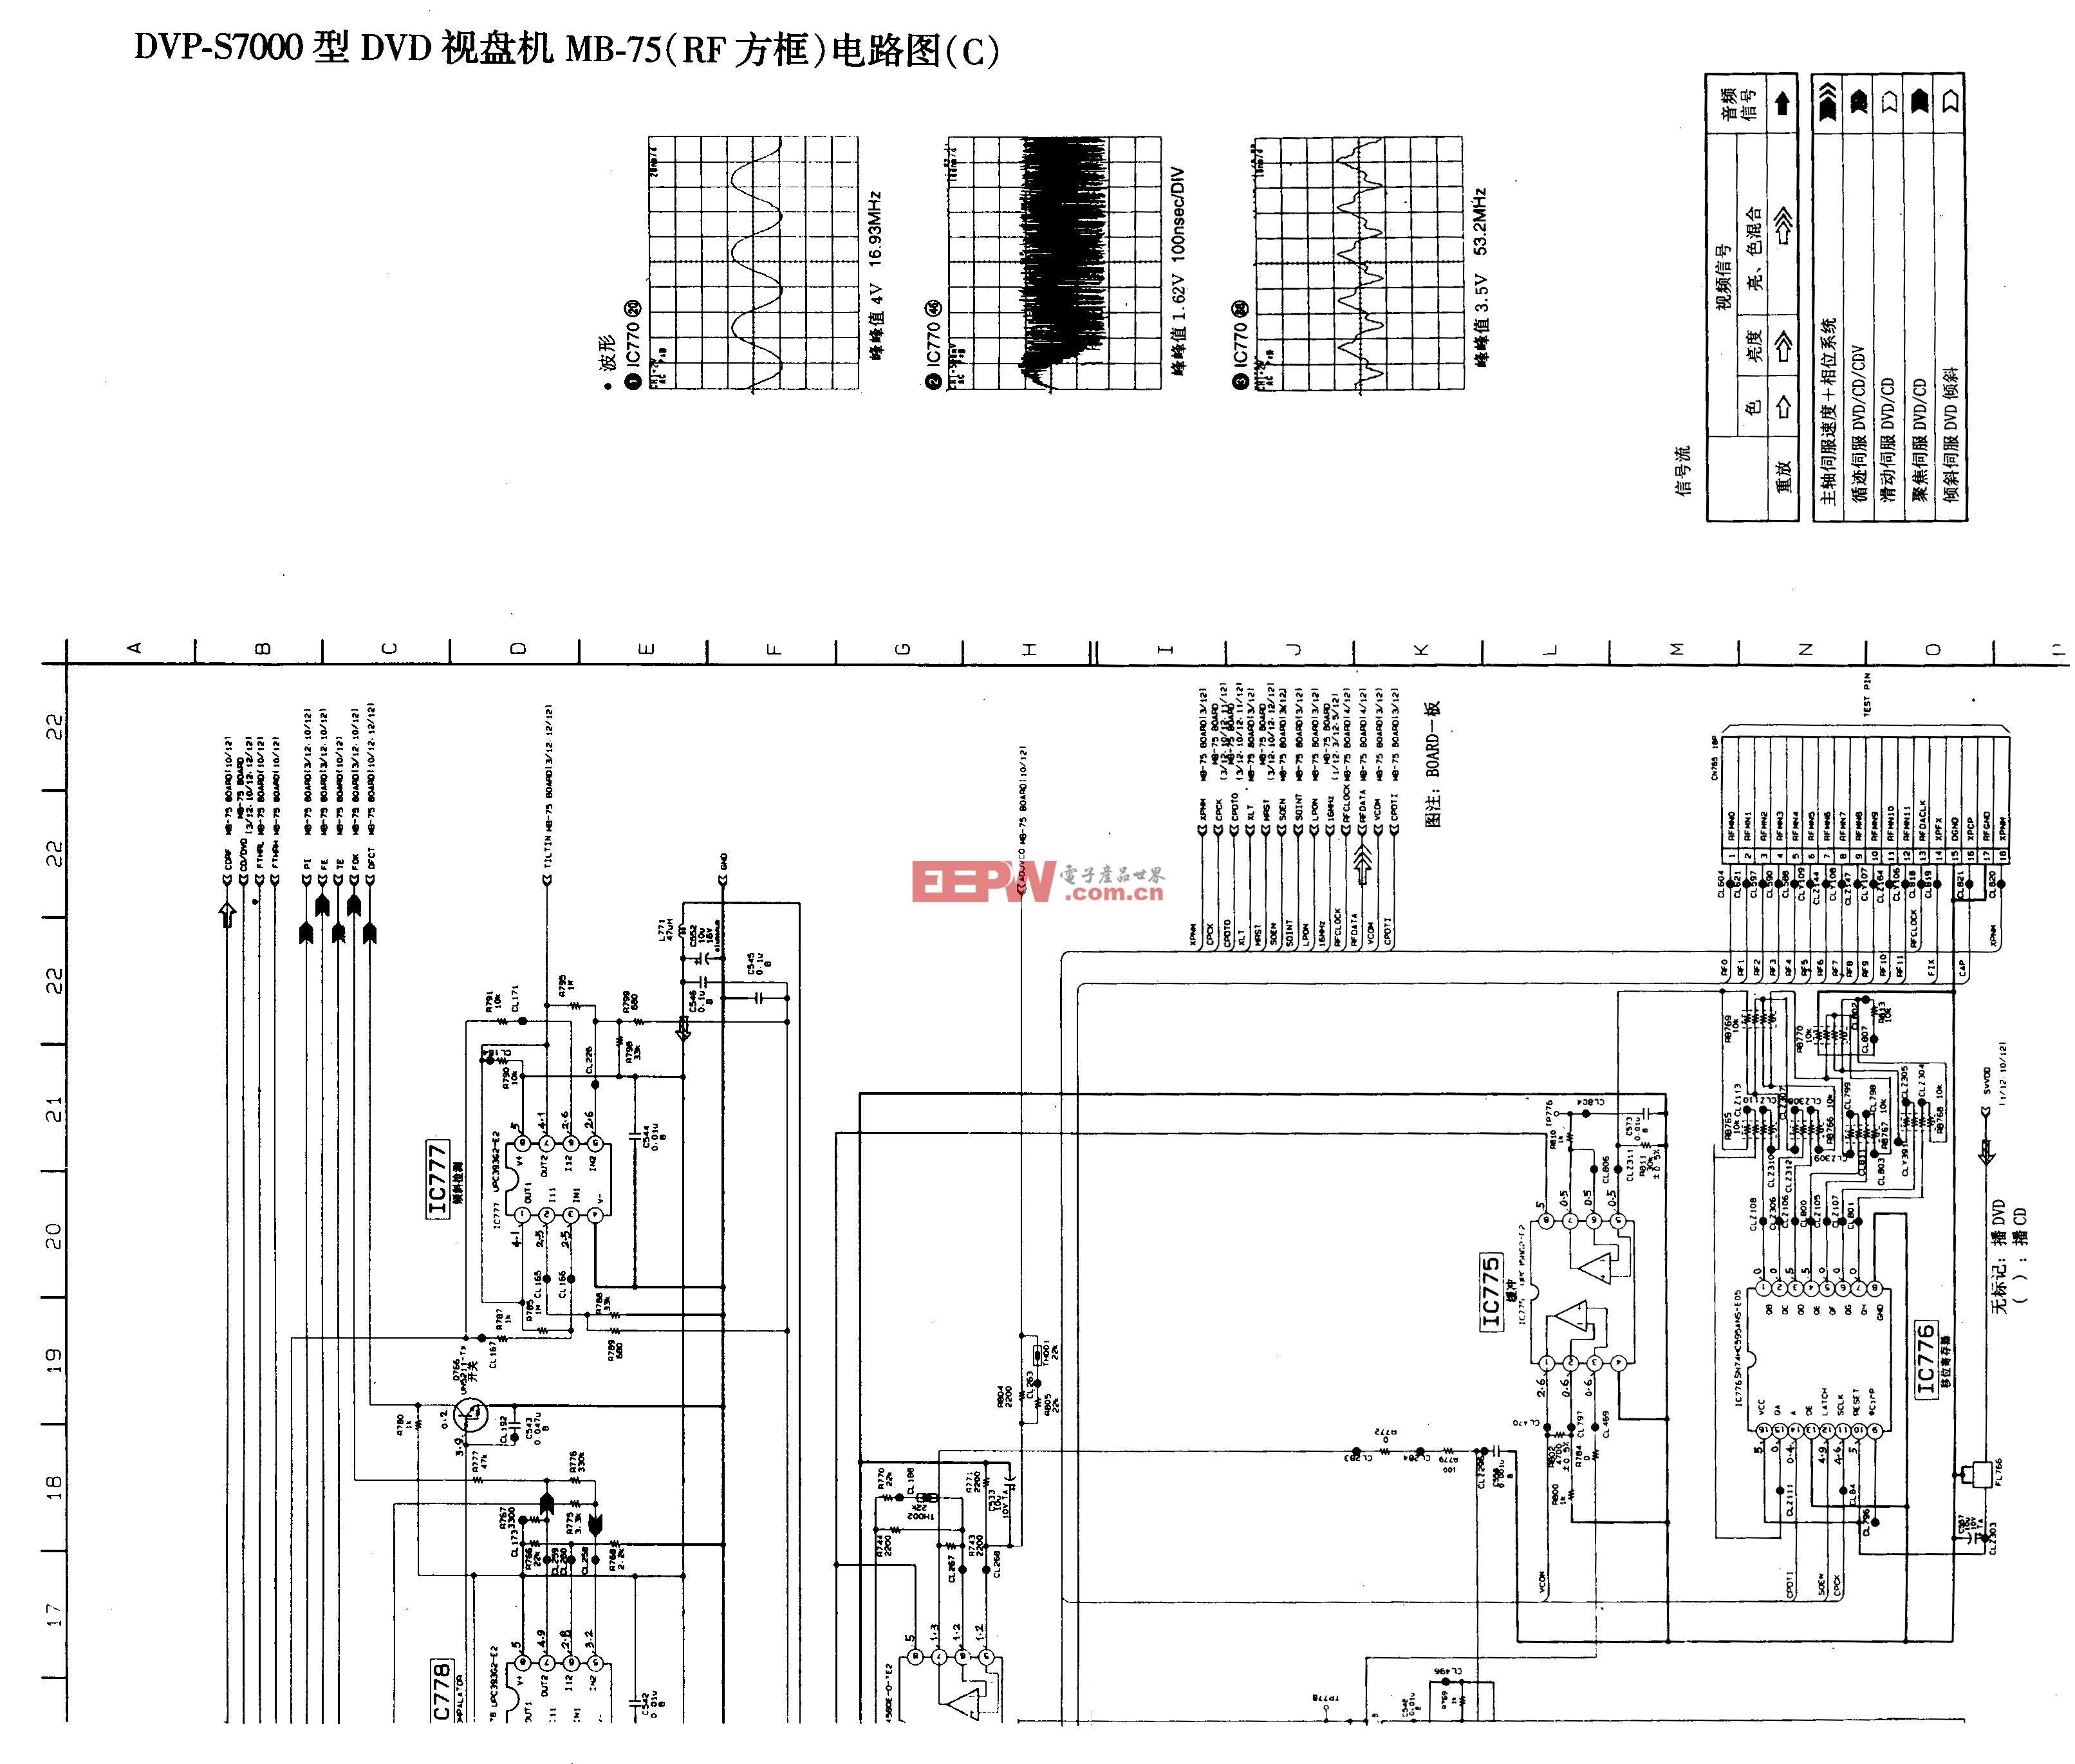 SONY DVP-S7000型DVD-MB-75(RF方框)图C